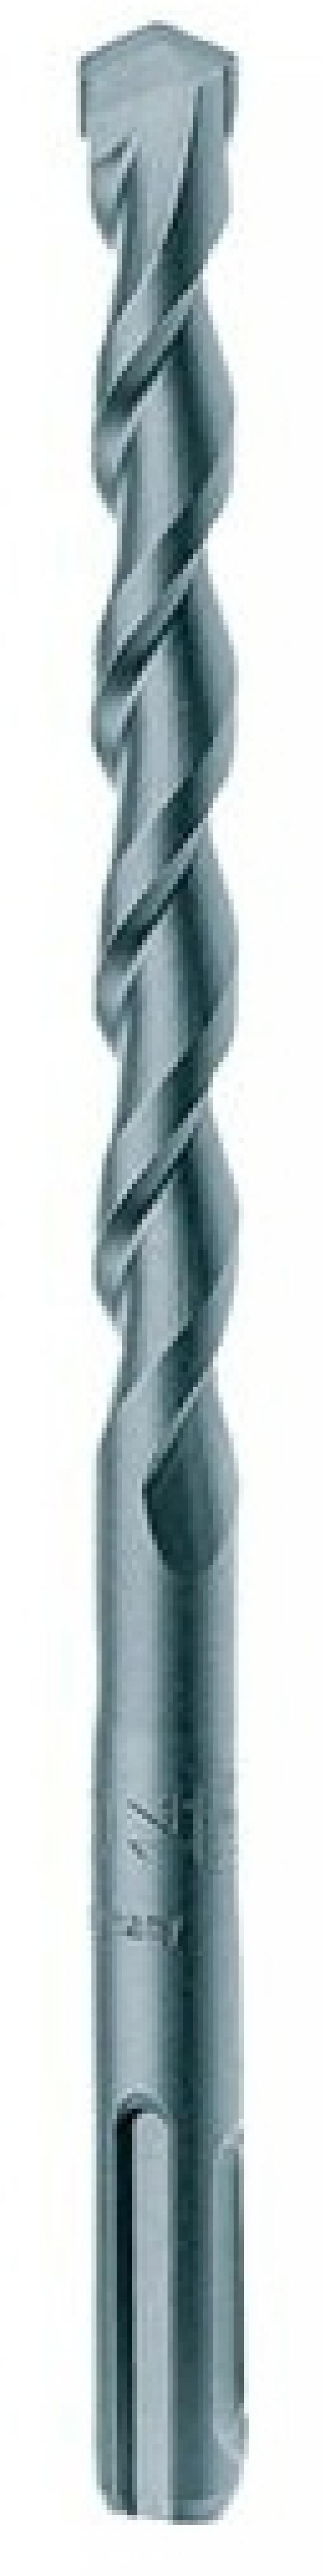 Бур Makita SDS-PLUS D-00262 14х160мм бур makita sds max